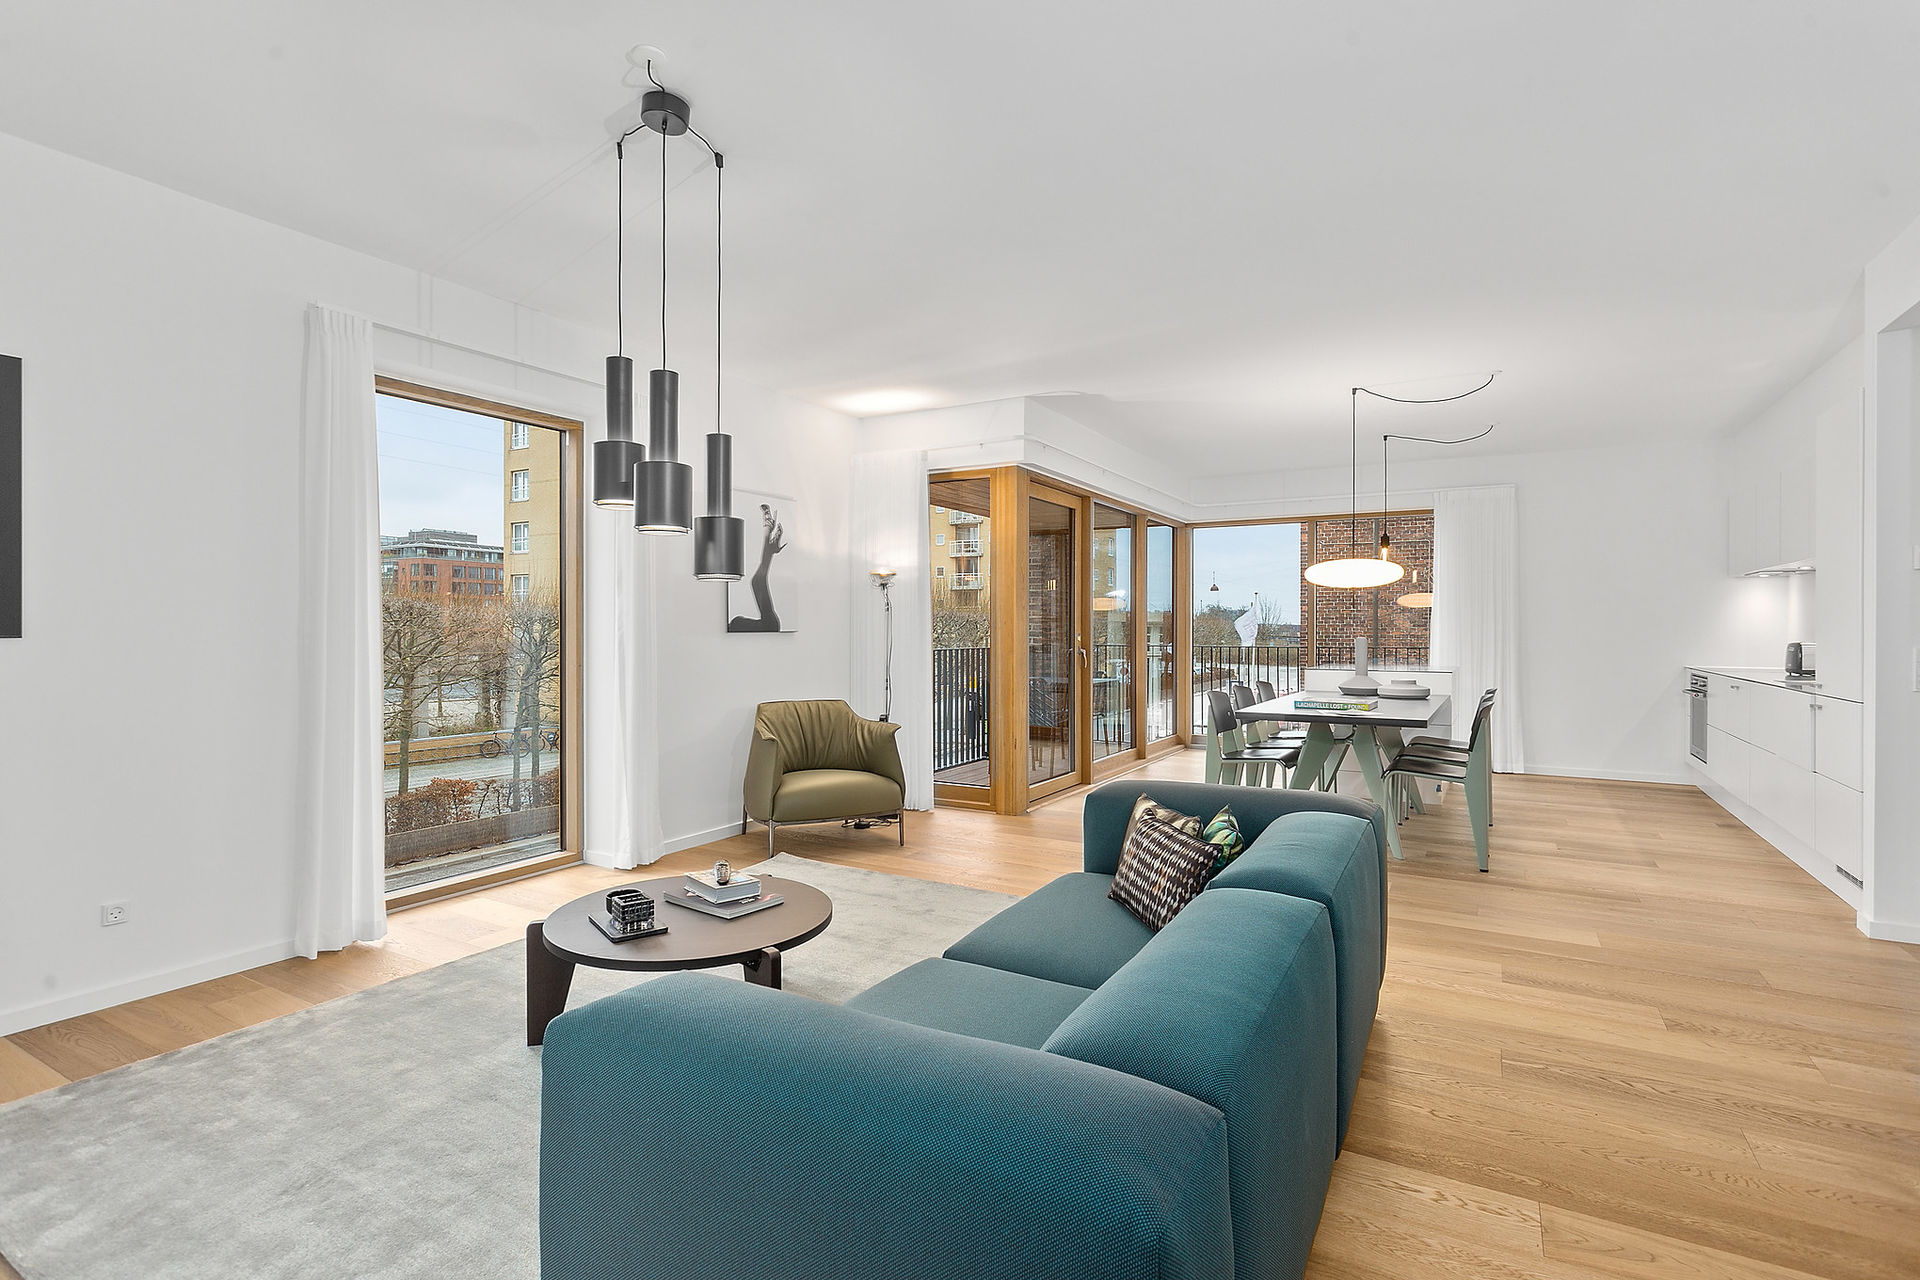 Østerbro 2 Bedroom Apartment